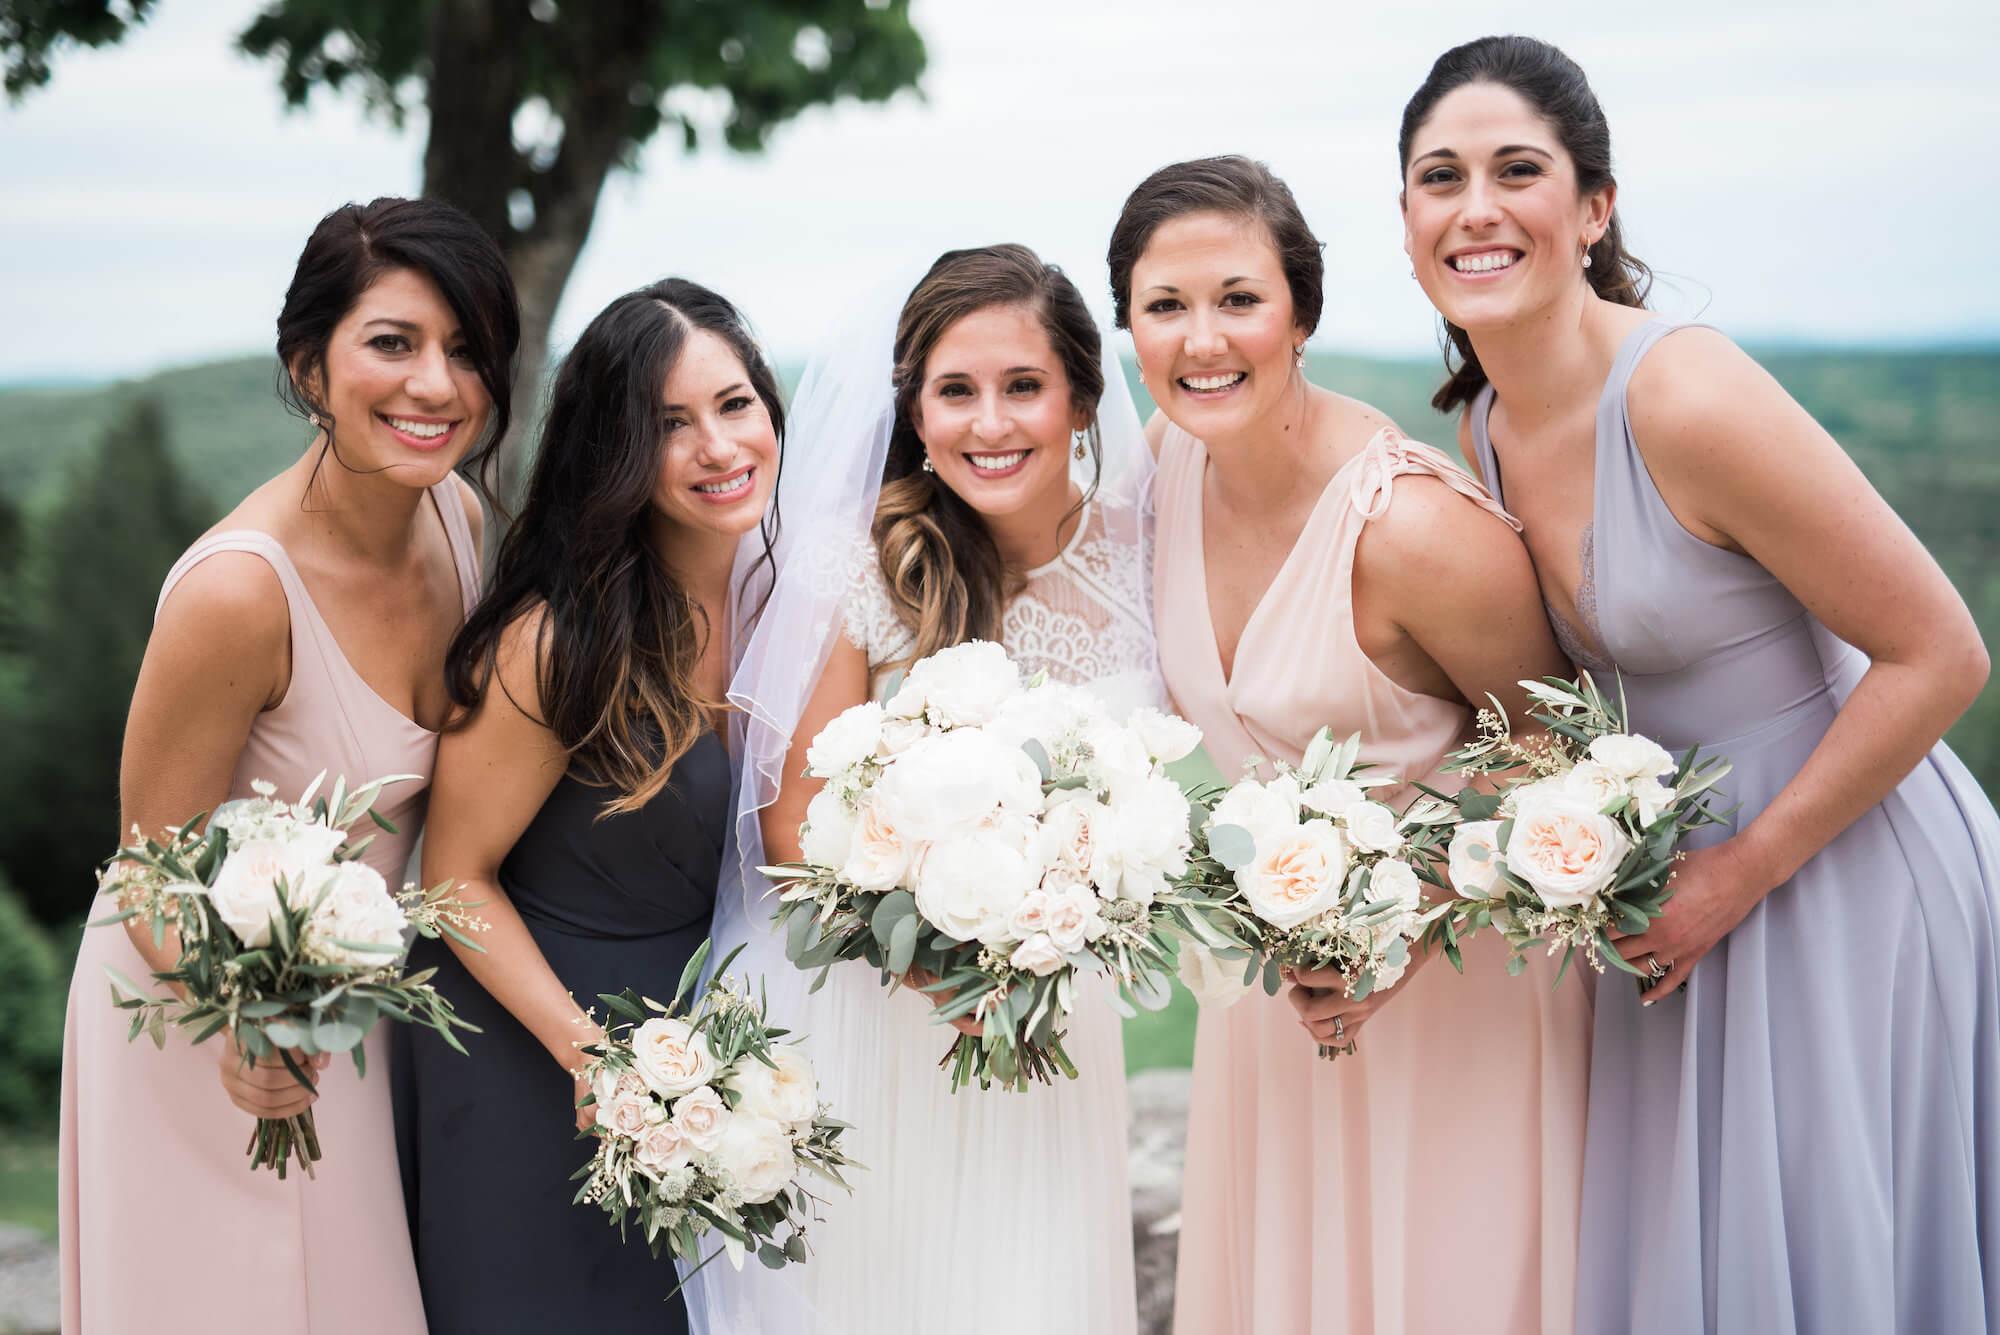 mix-matched-bridesmaid-dresses.jpg